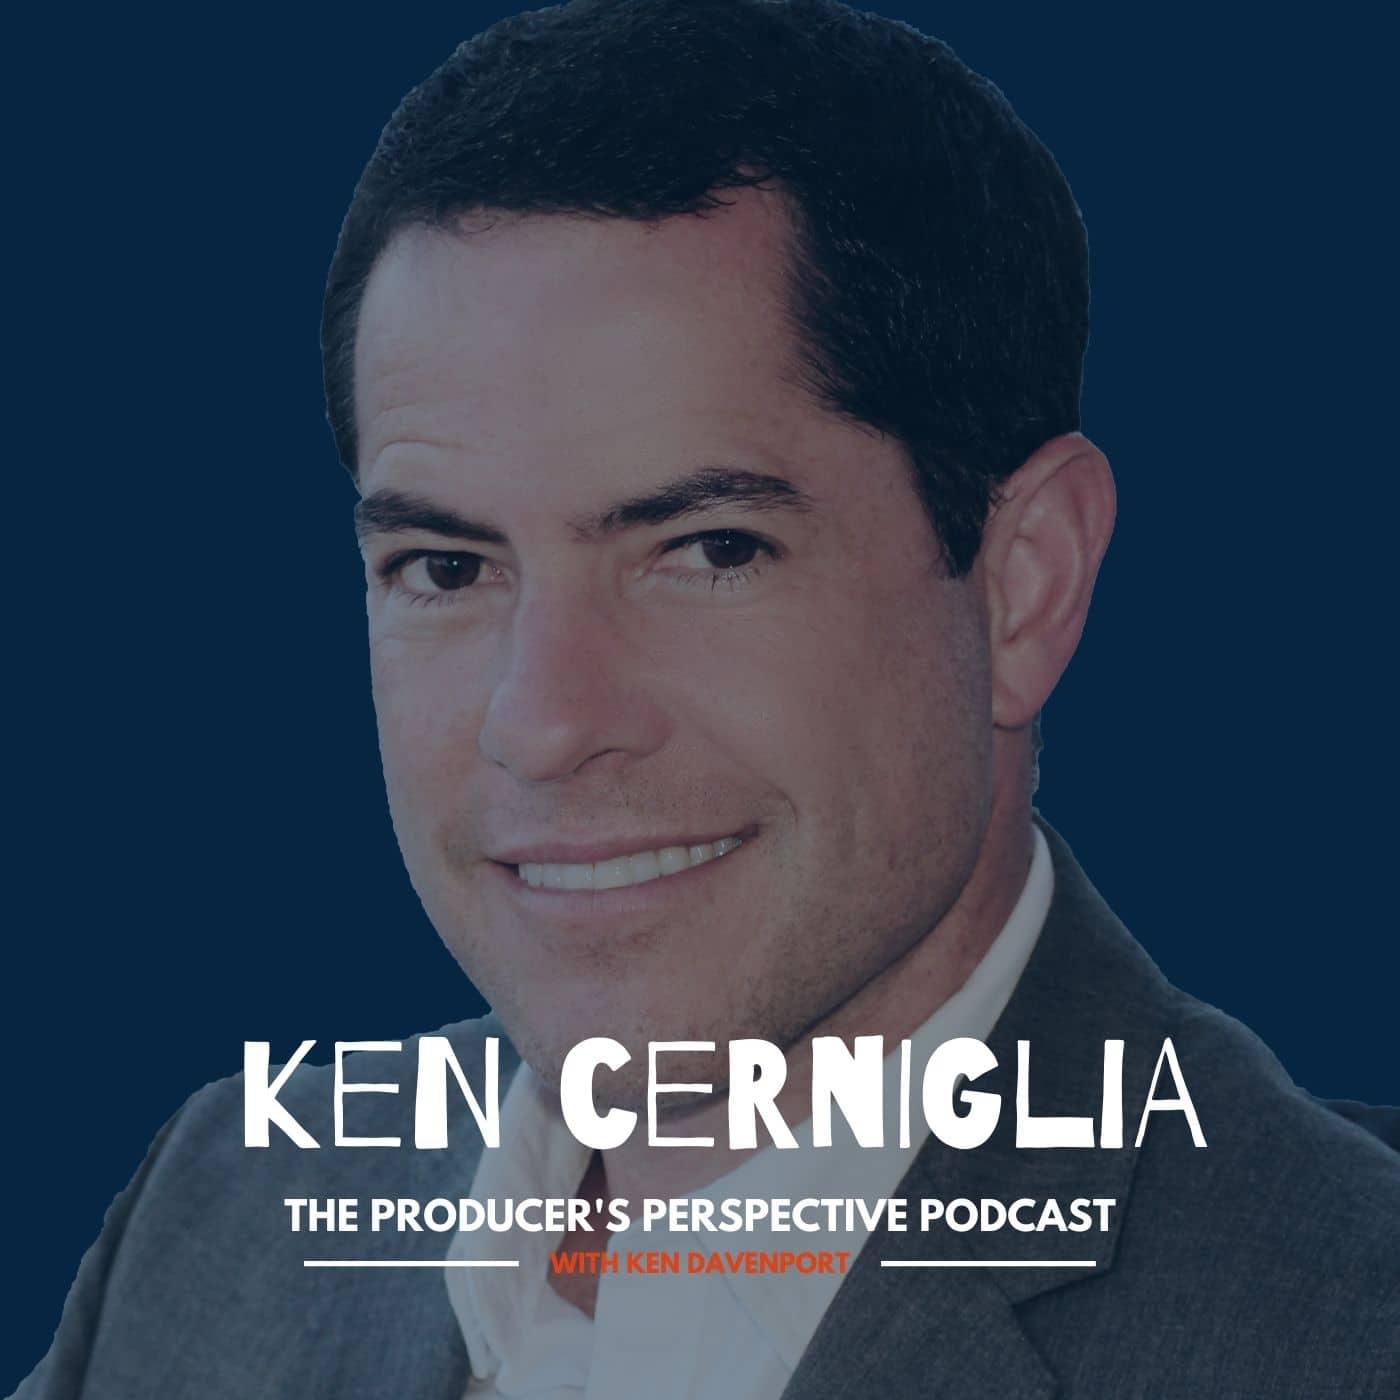 Ken Davenport's The Producer's Perspective Podcast Episode 202 - Ken Cerniglia